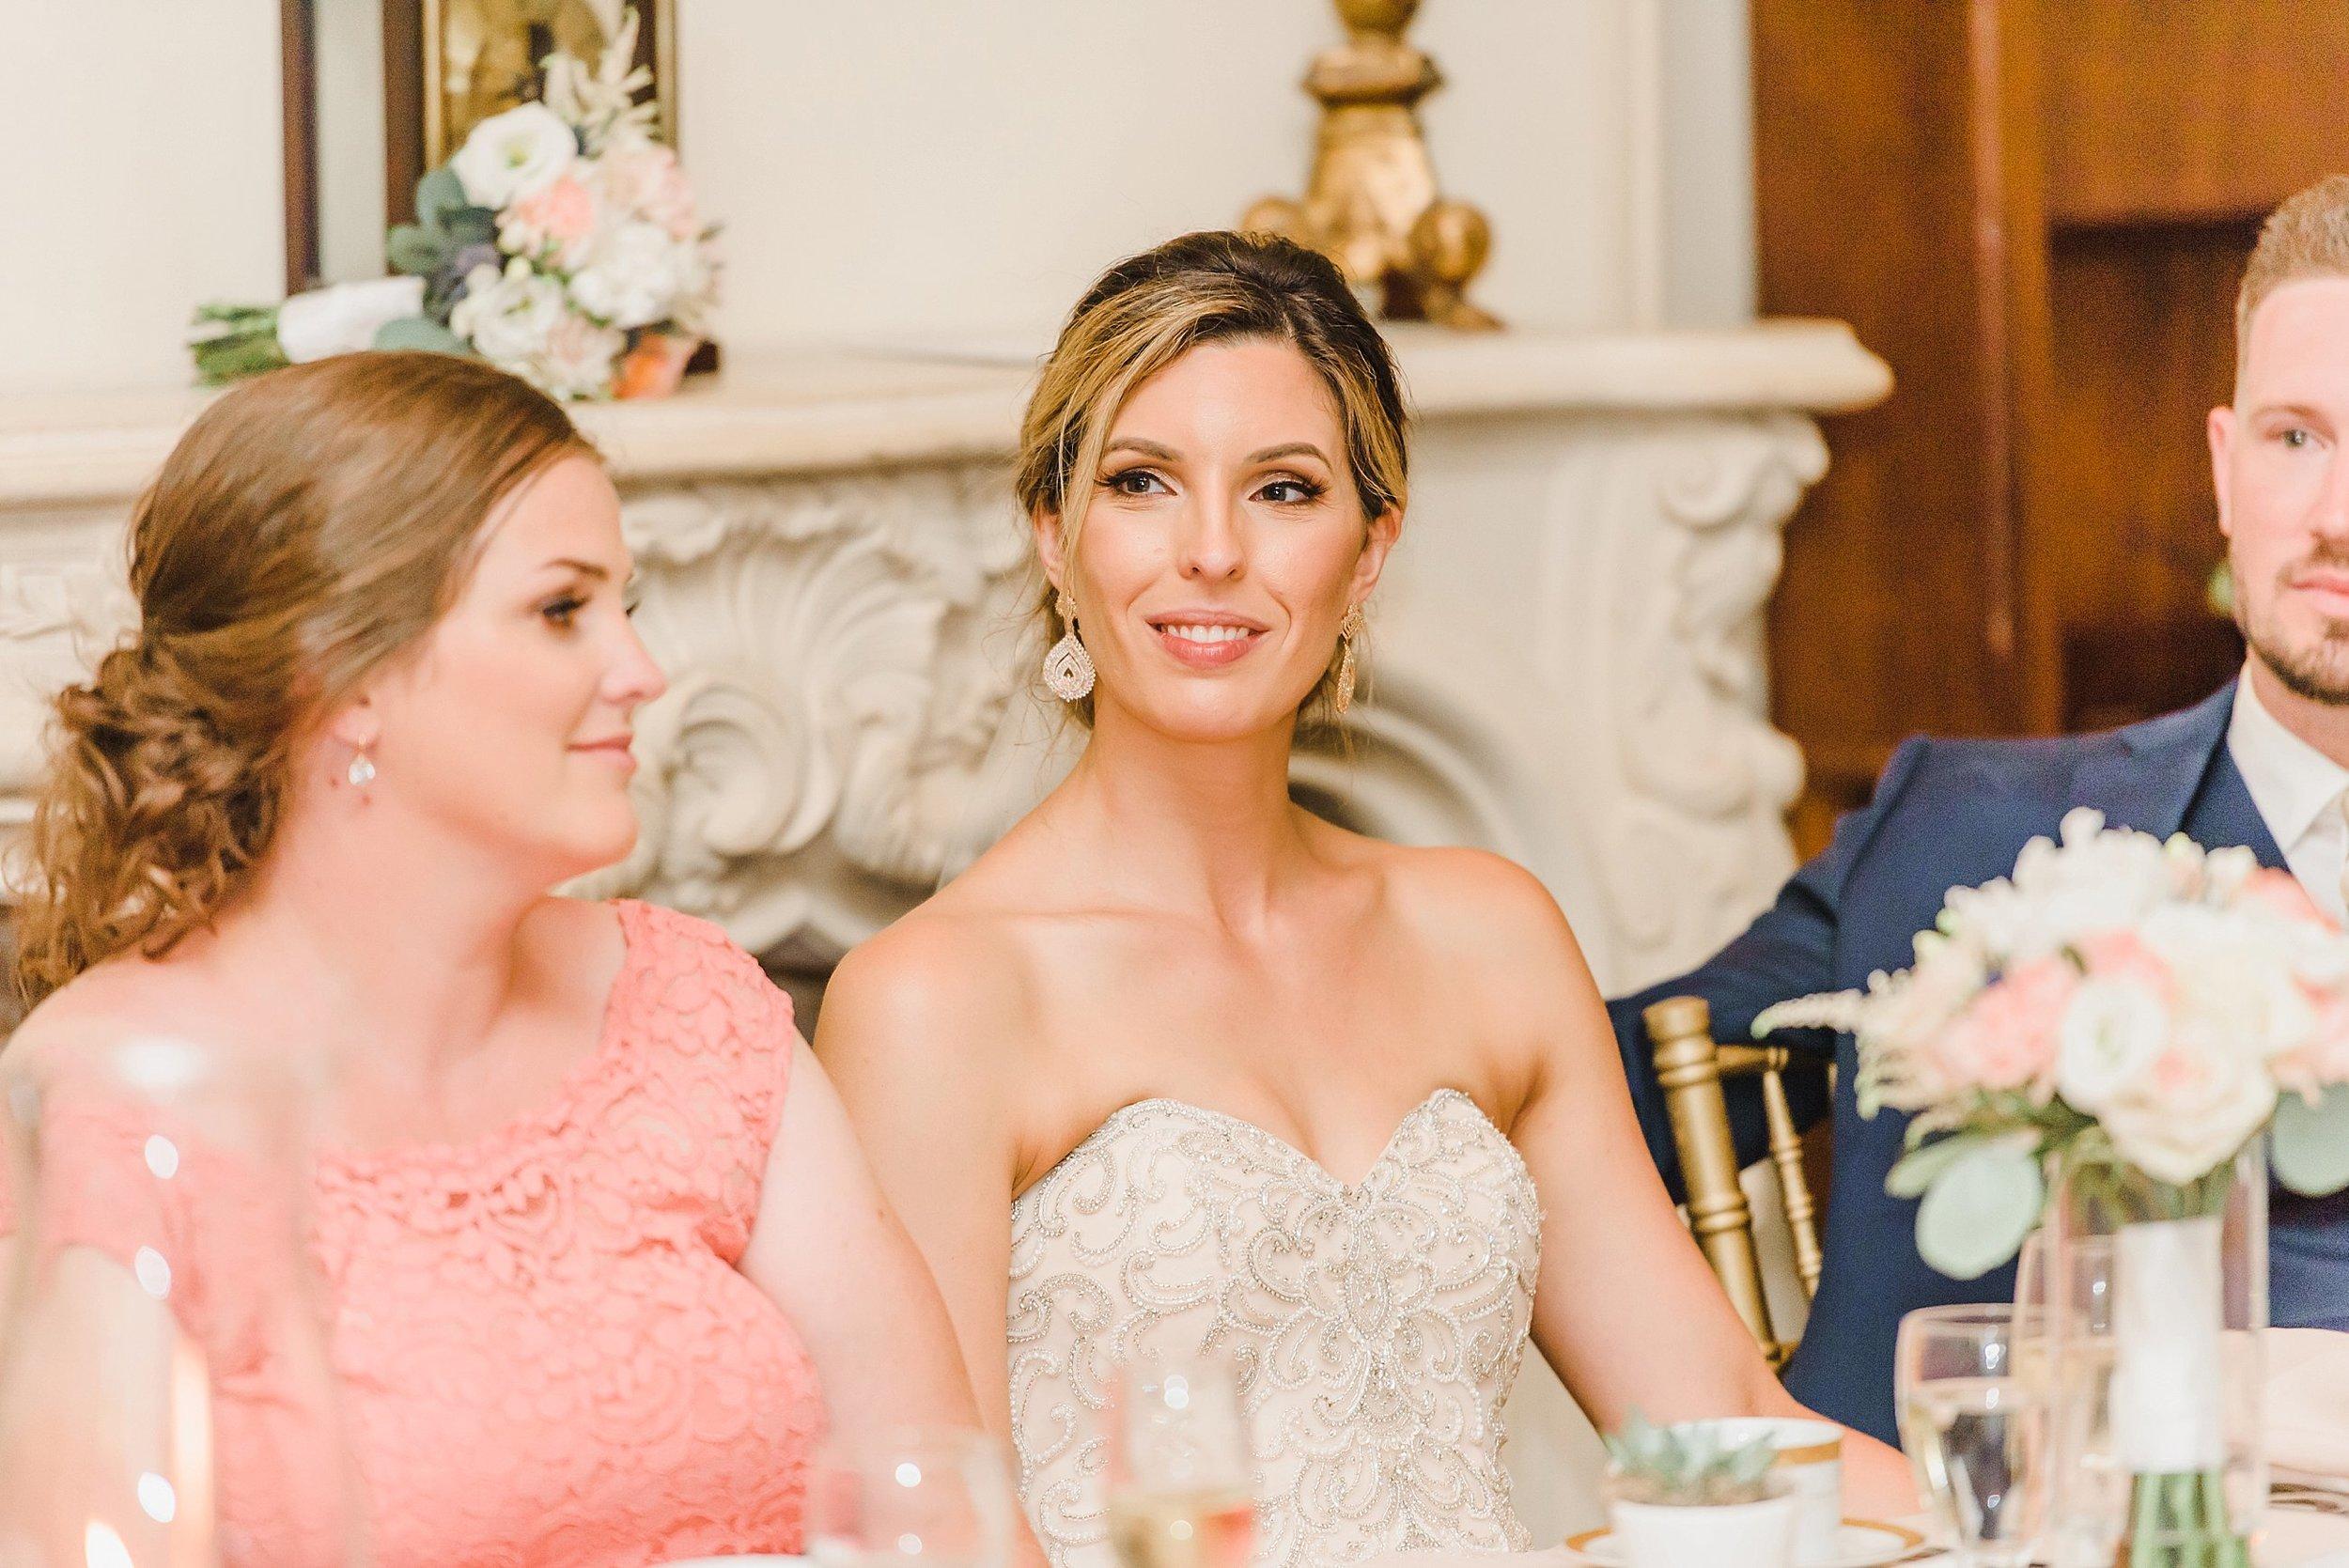 light airy indie fine art ottawa wedding photographer | Ali and Batoul Photography_0220.jpg